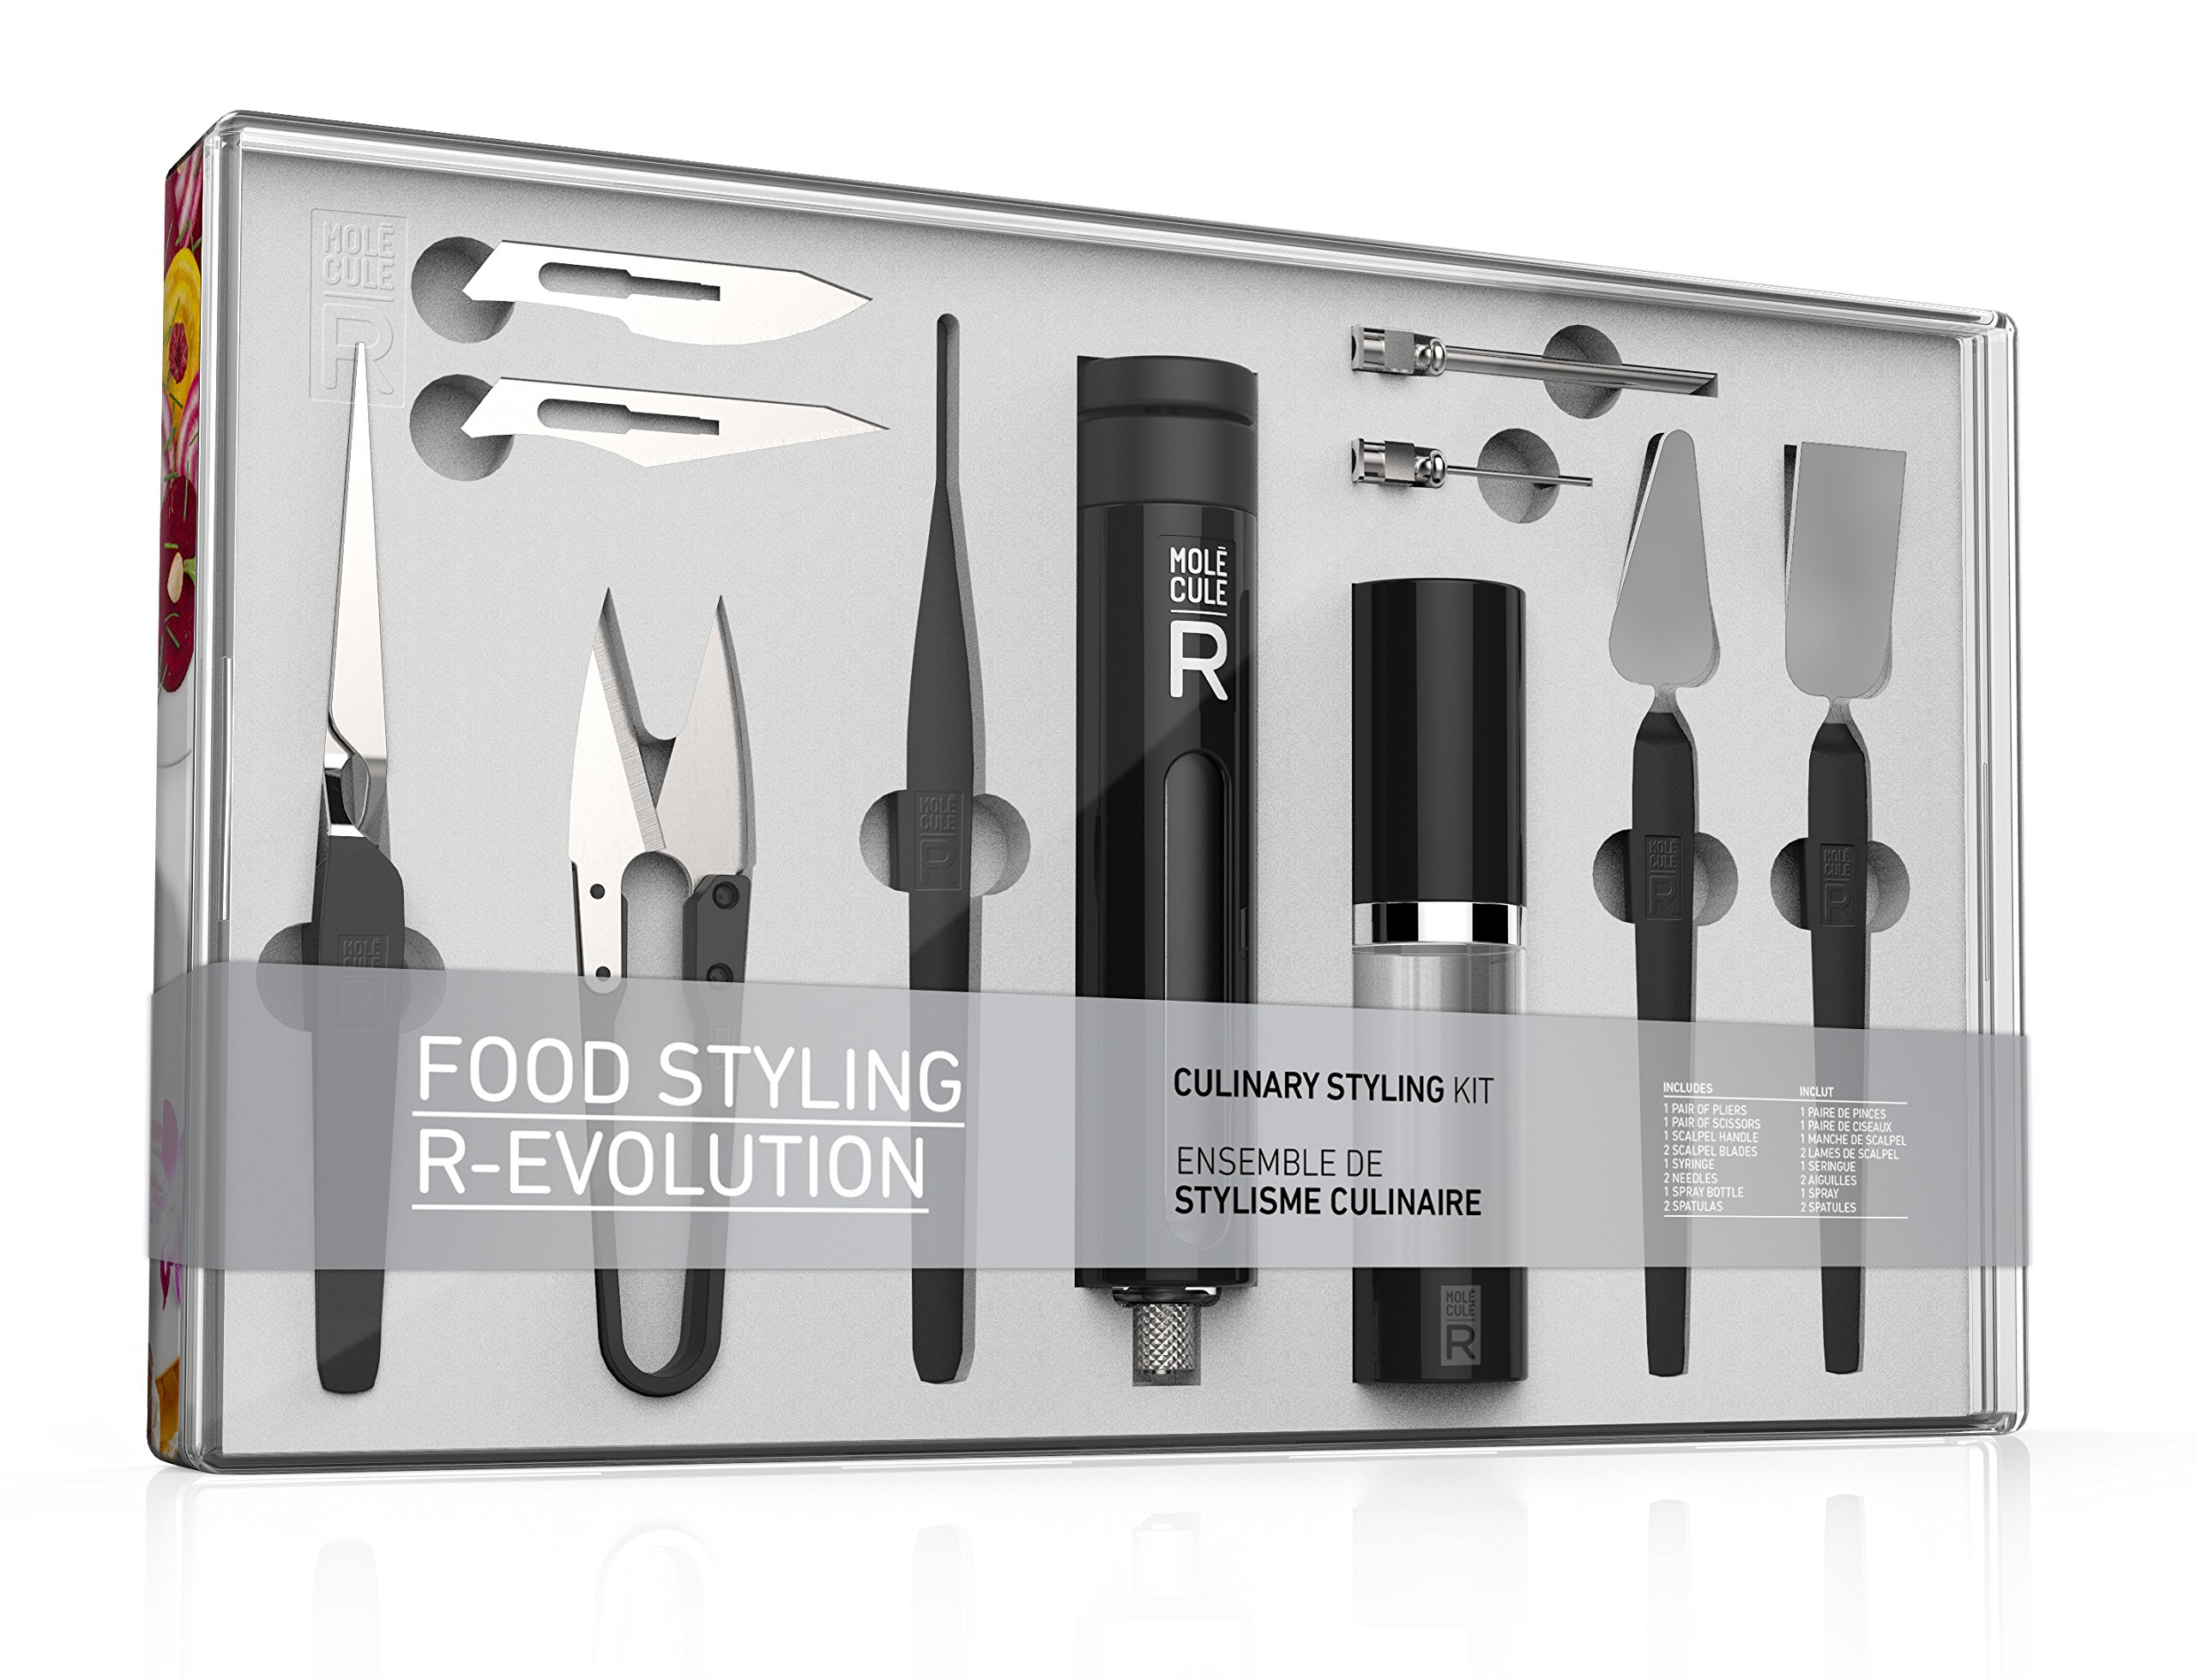 Molecule r cuisine r evolution kit lb grocery gourmet food - Cuisine r evolution recipes ...